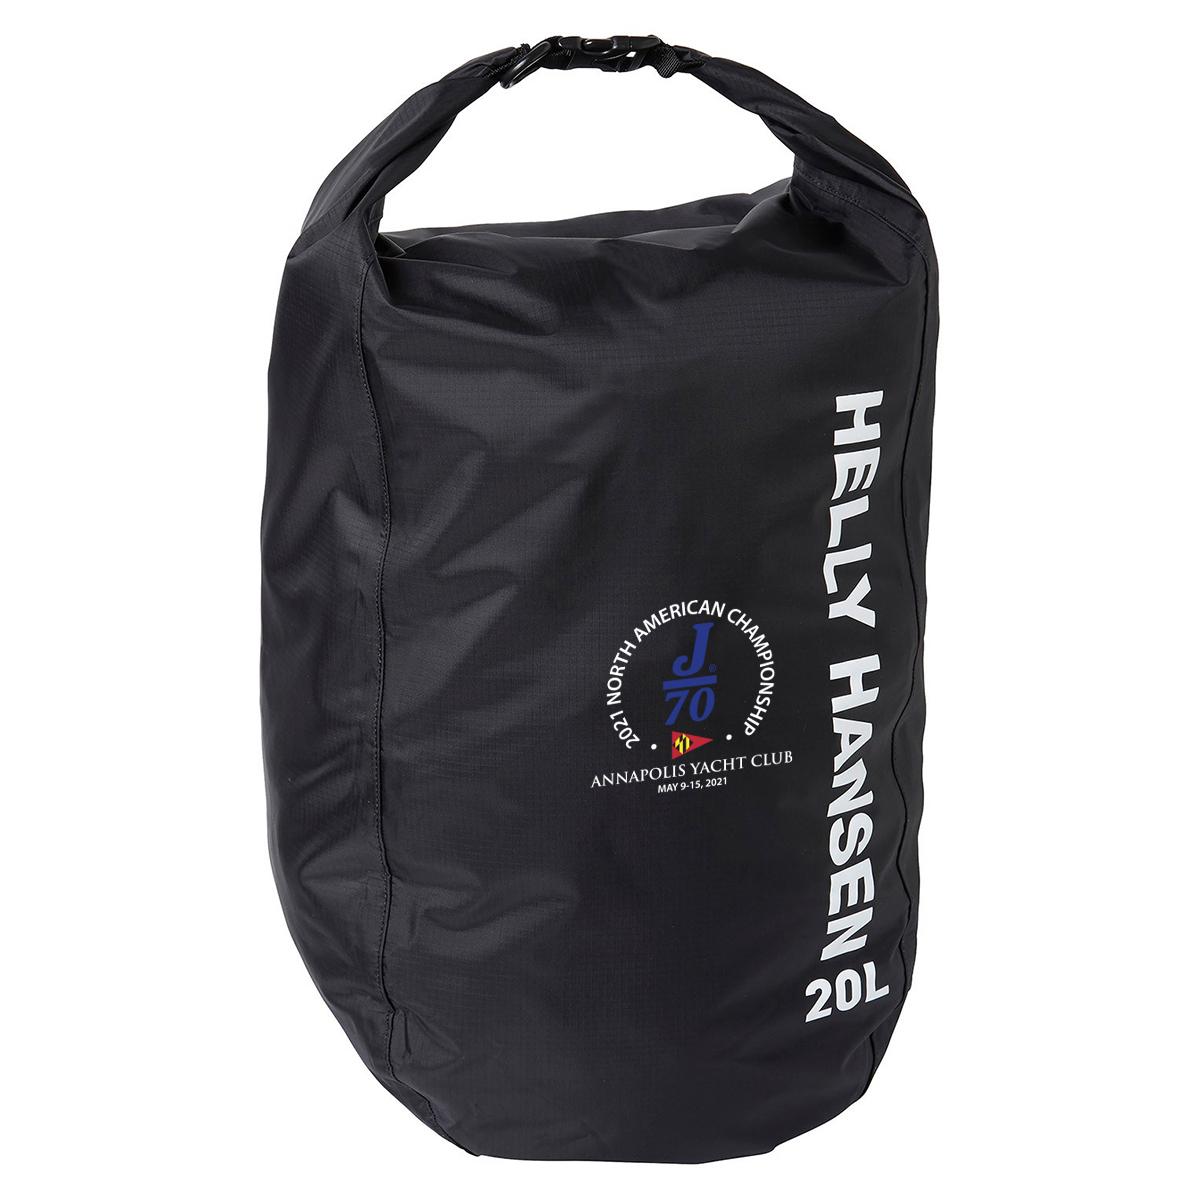 J70 North Americans 2021 Helly Hansen Light Dry Bag 20 L